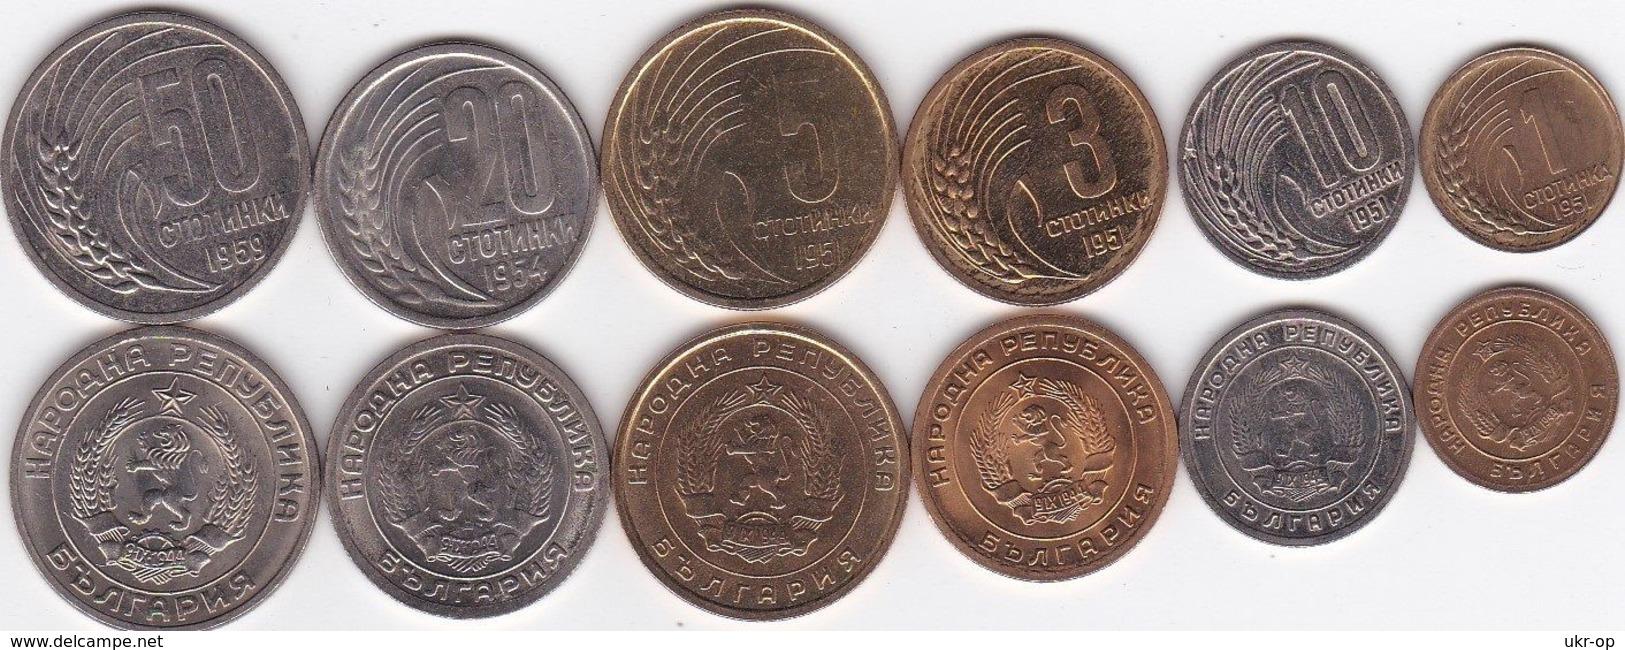 Bulgaria - 1 2 5 10 20 50 Stotinki 1951 - 1959 UNC Set 6 Coins Ukr-OP - Bulgarije